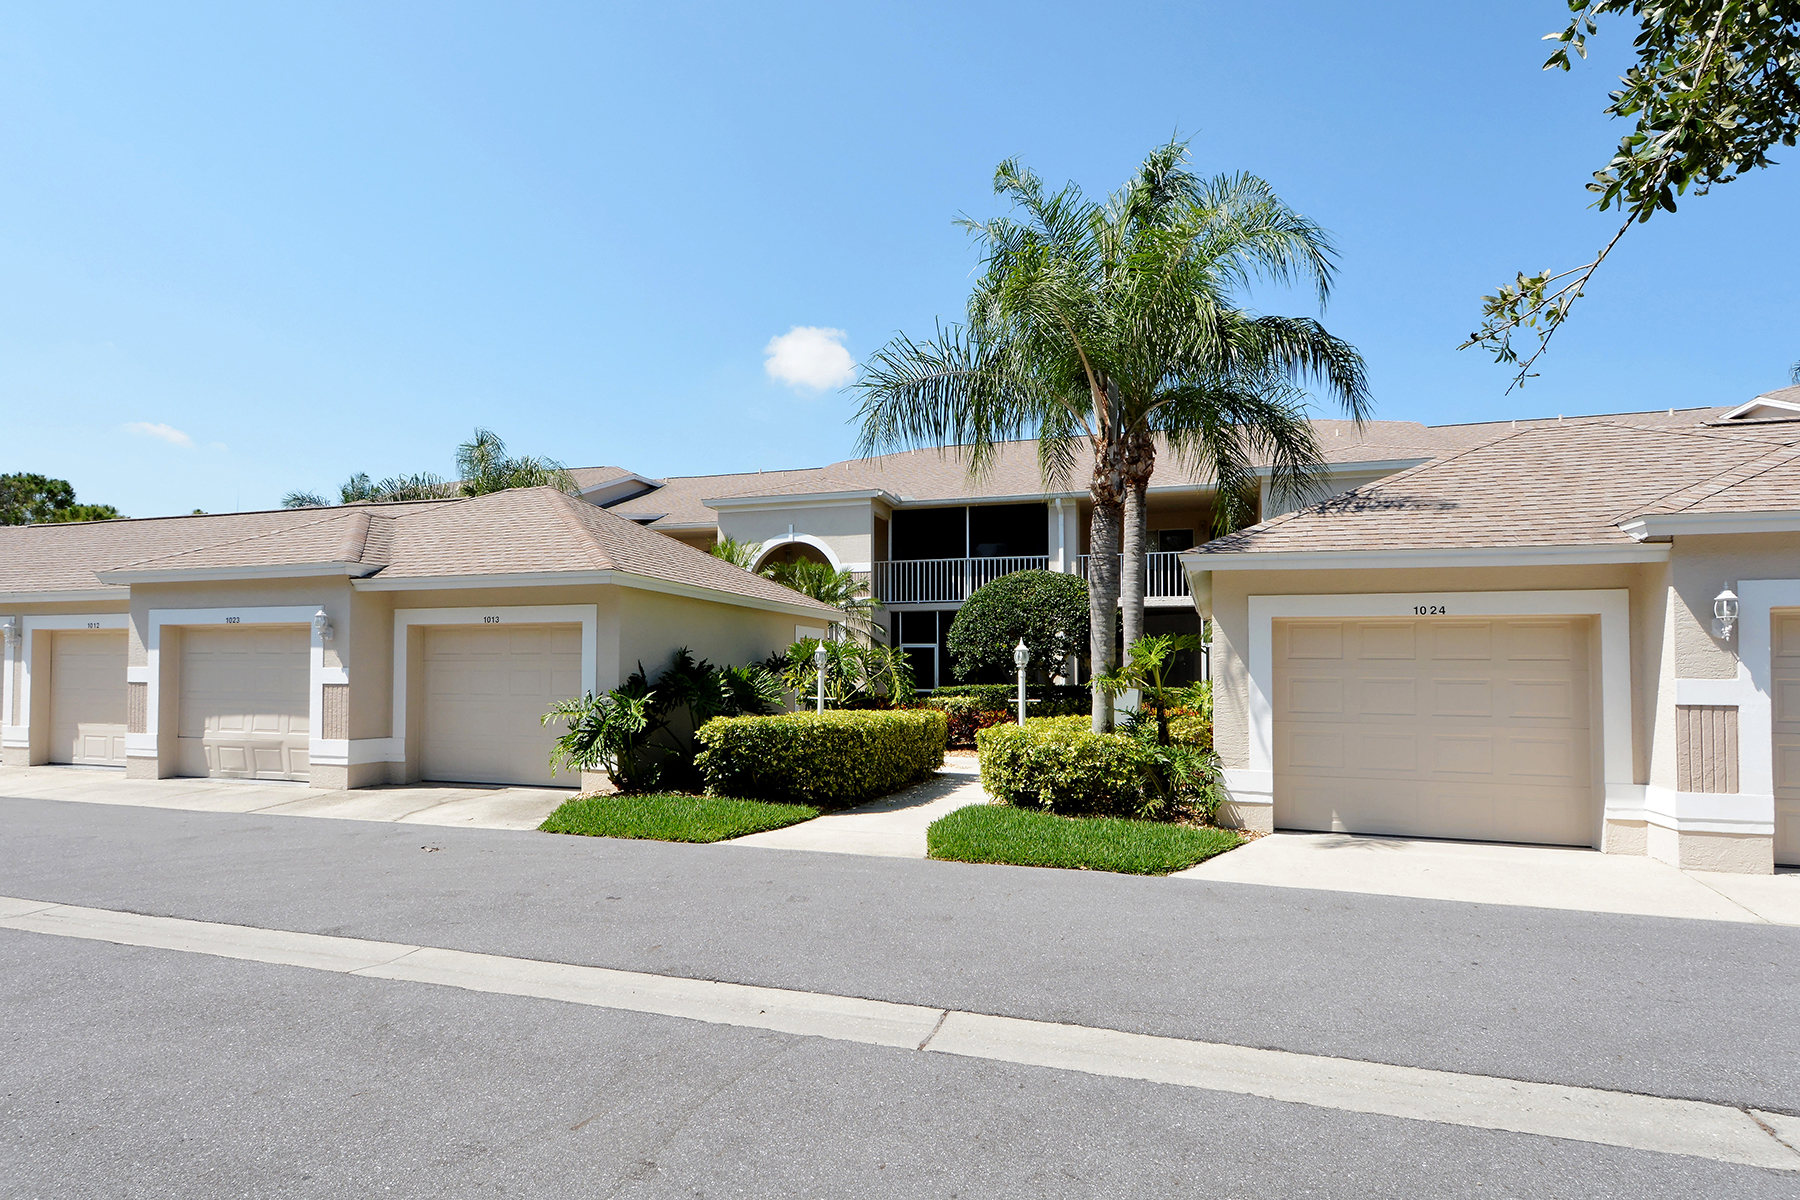 Condominium for Sale at SARASOTA 9621 Castle Point Dr 1013 Sarasota, Florida, 34238 United States